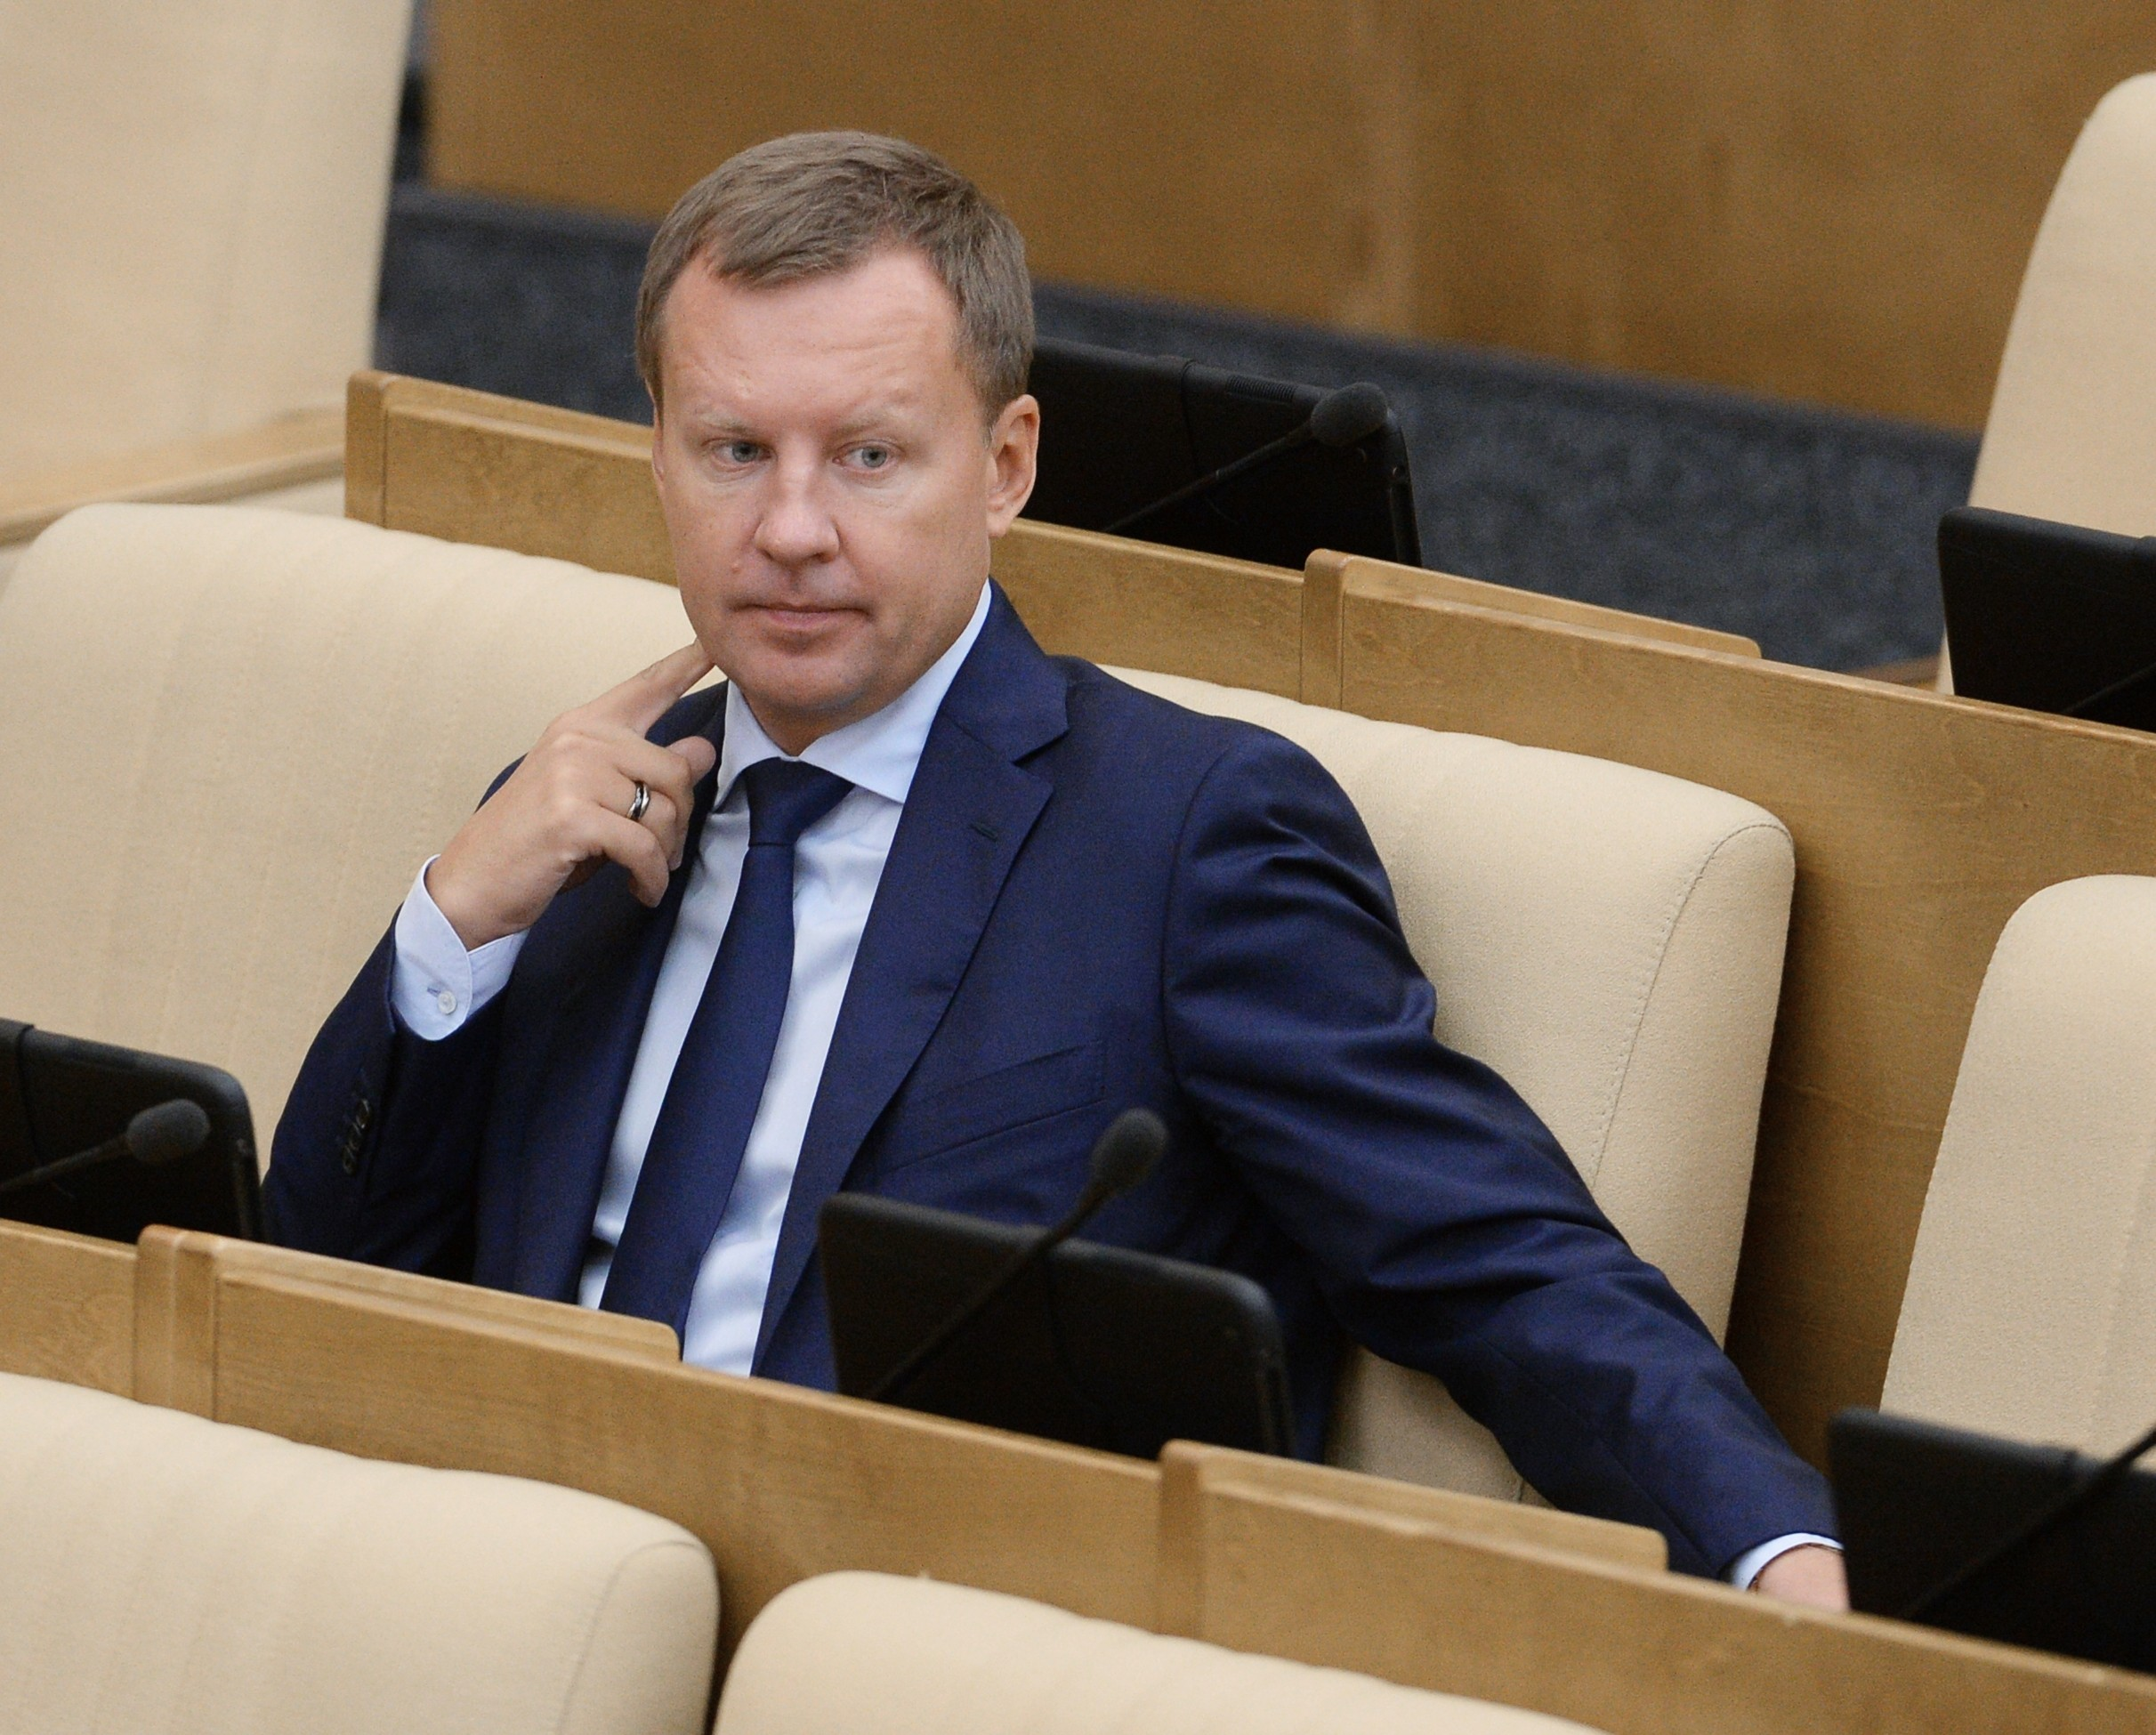 <p><span>Фото &copy; РИА Новости/Владимир Федоренко</span></p>